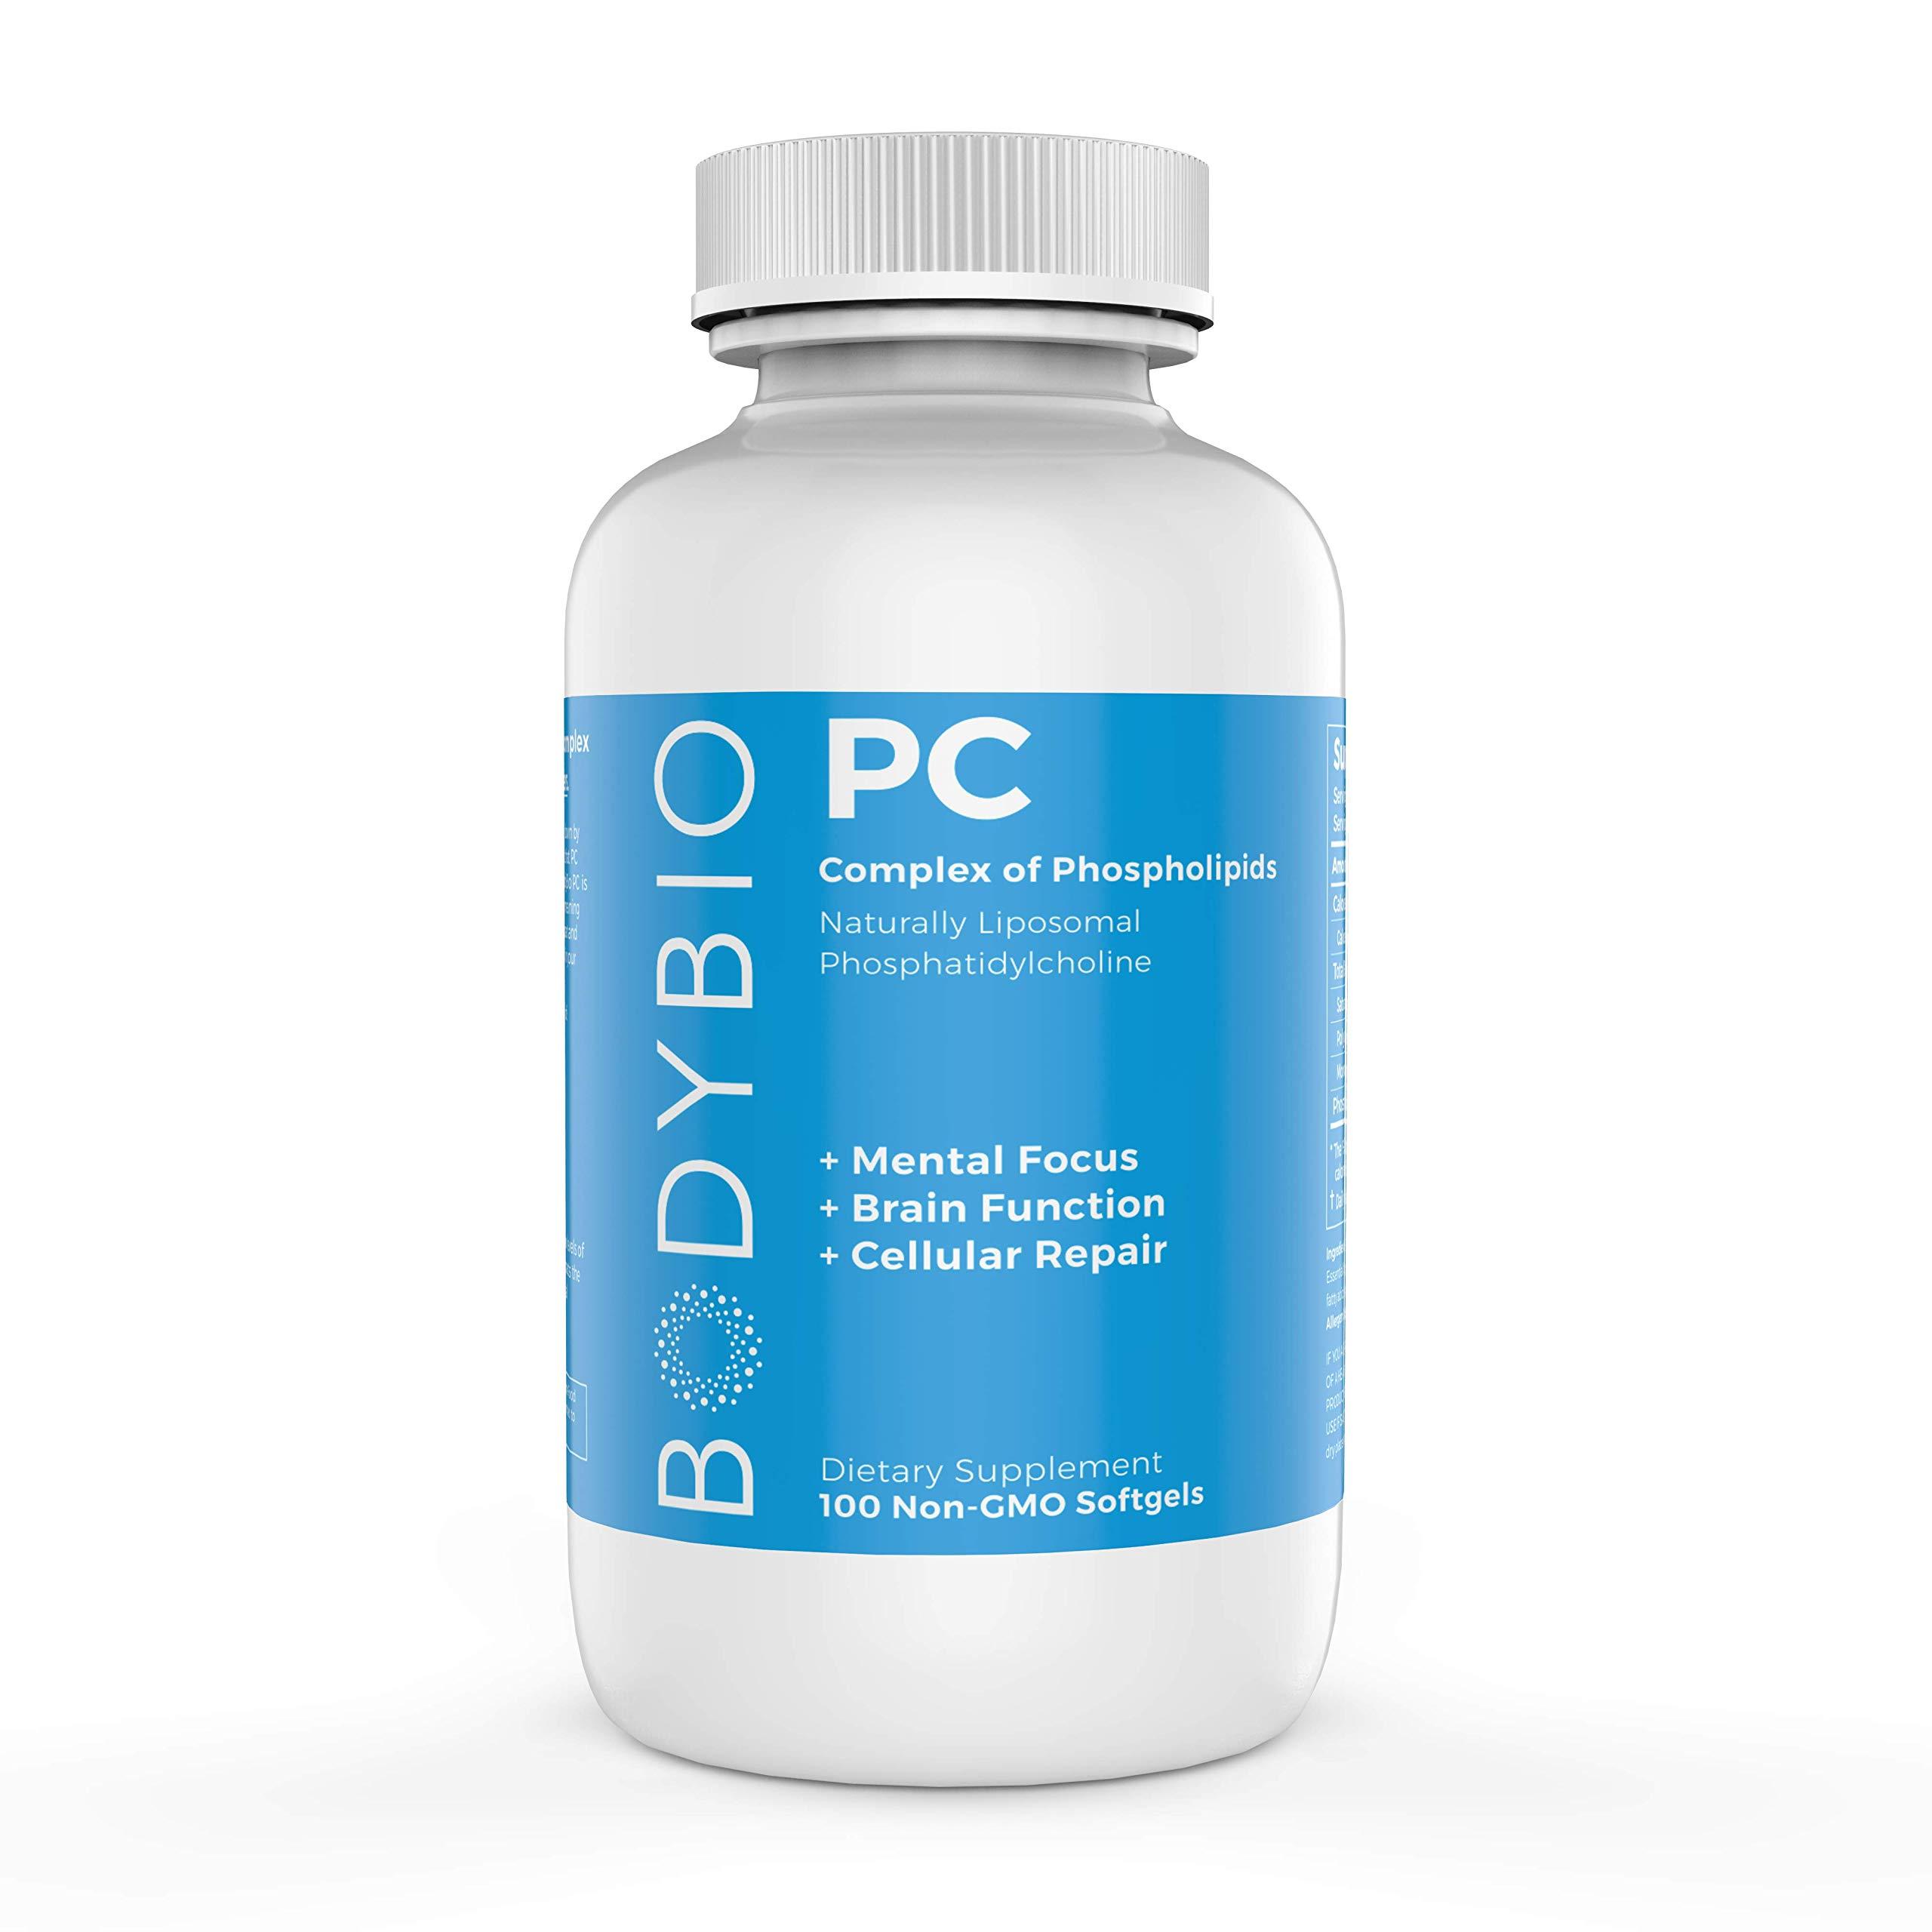 BodyBio - PC Phosphatidylcholine, Phospholipid complex - Increased Bioavailability for Brain Health - Enhance Brain Function, Focus, Memory & Clarity - 100 Softgels